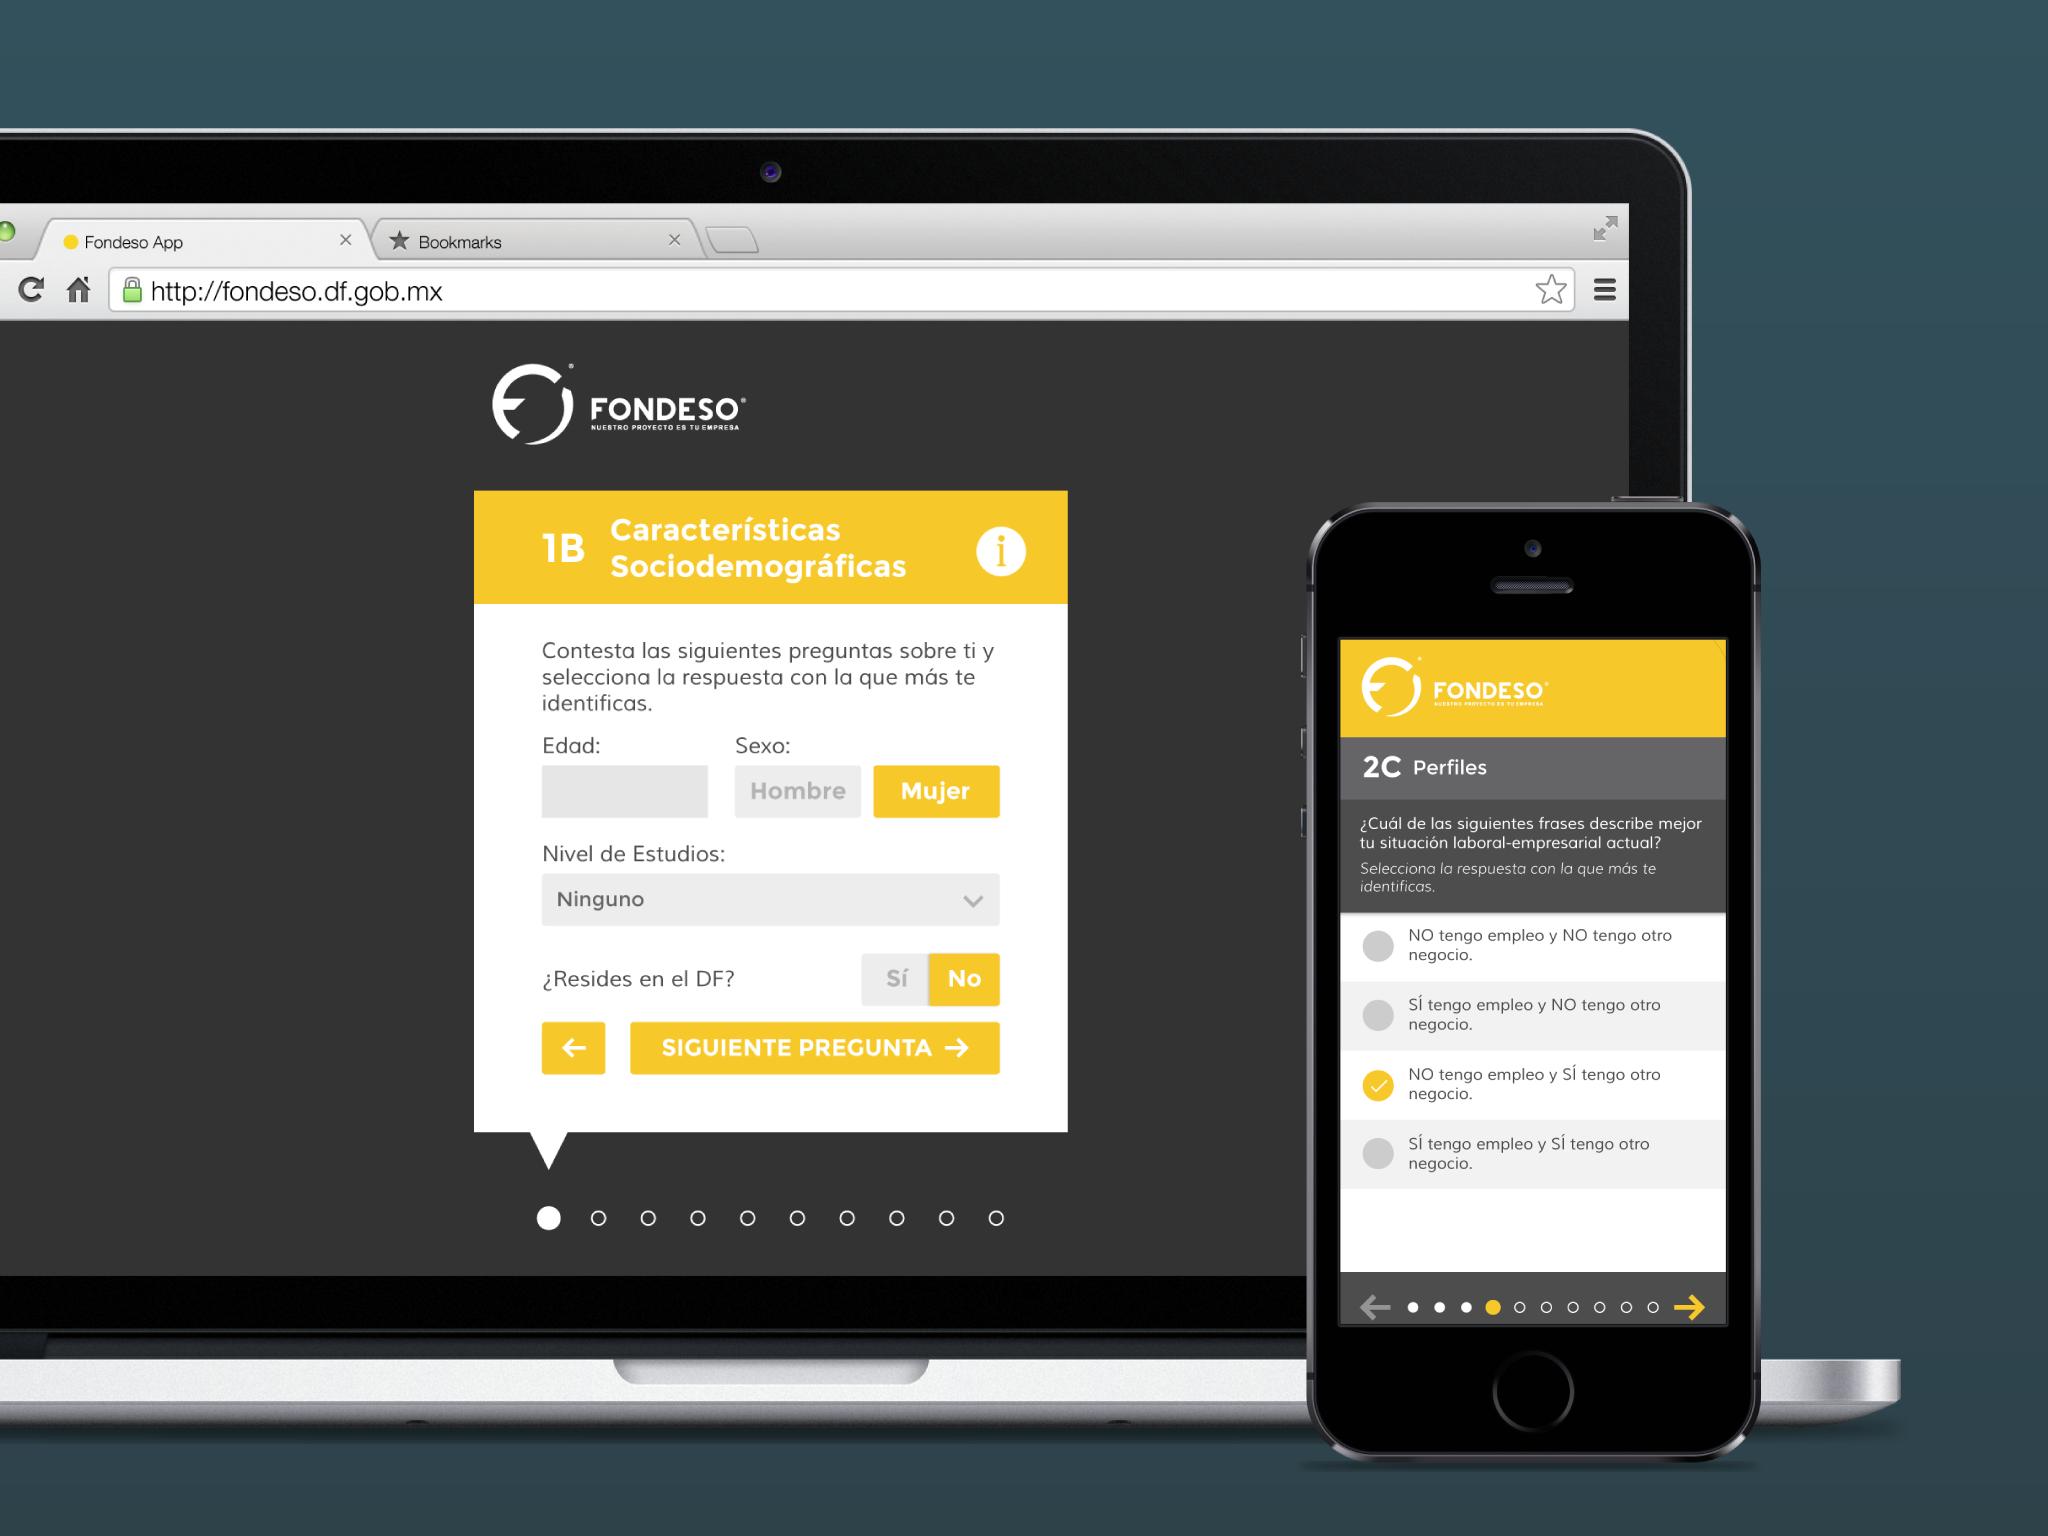 Fondeso web app